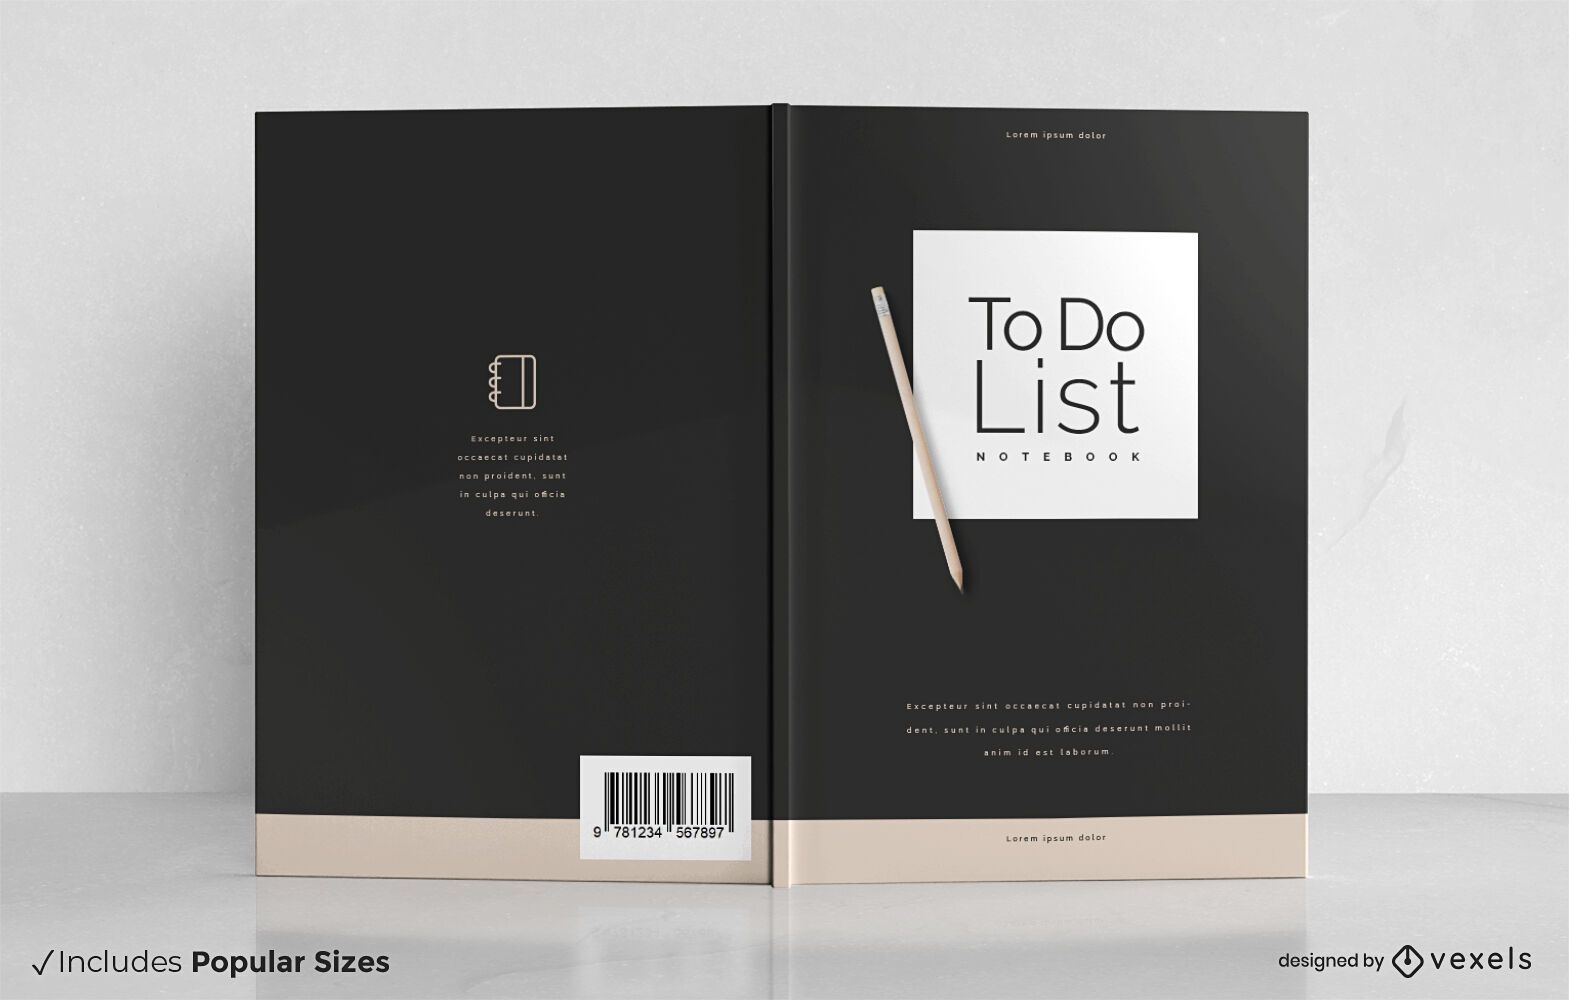 To do list notebook cover design